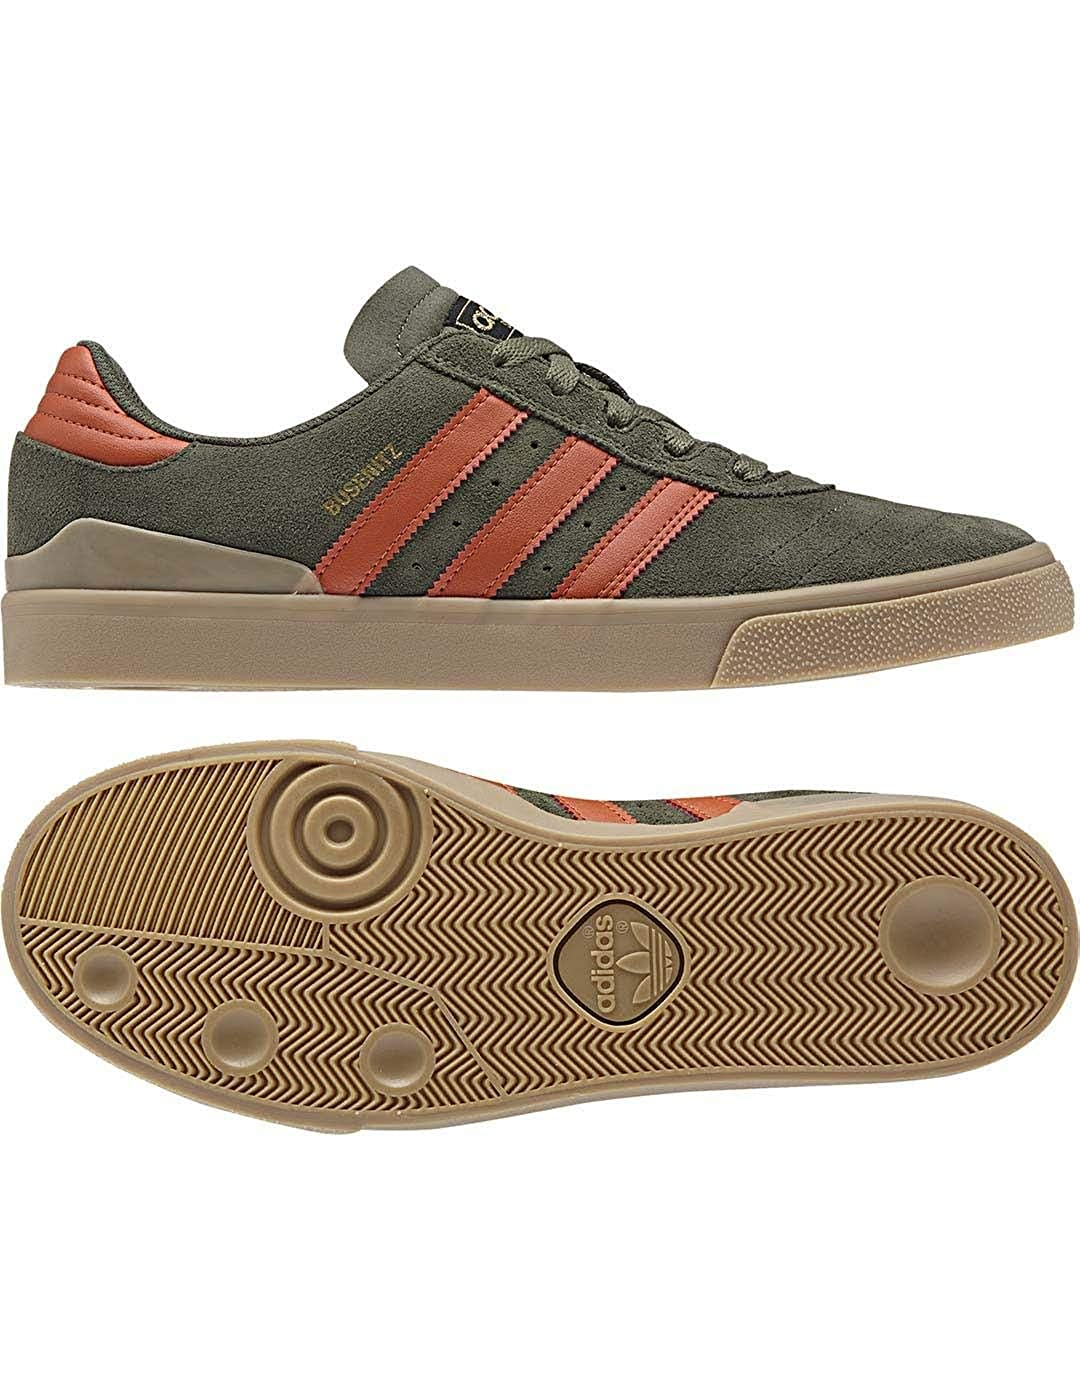 Adidas Busenitz Vulc Schuh Vulc grün c0a5c0